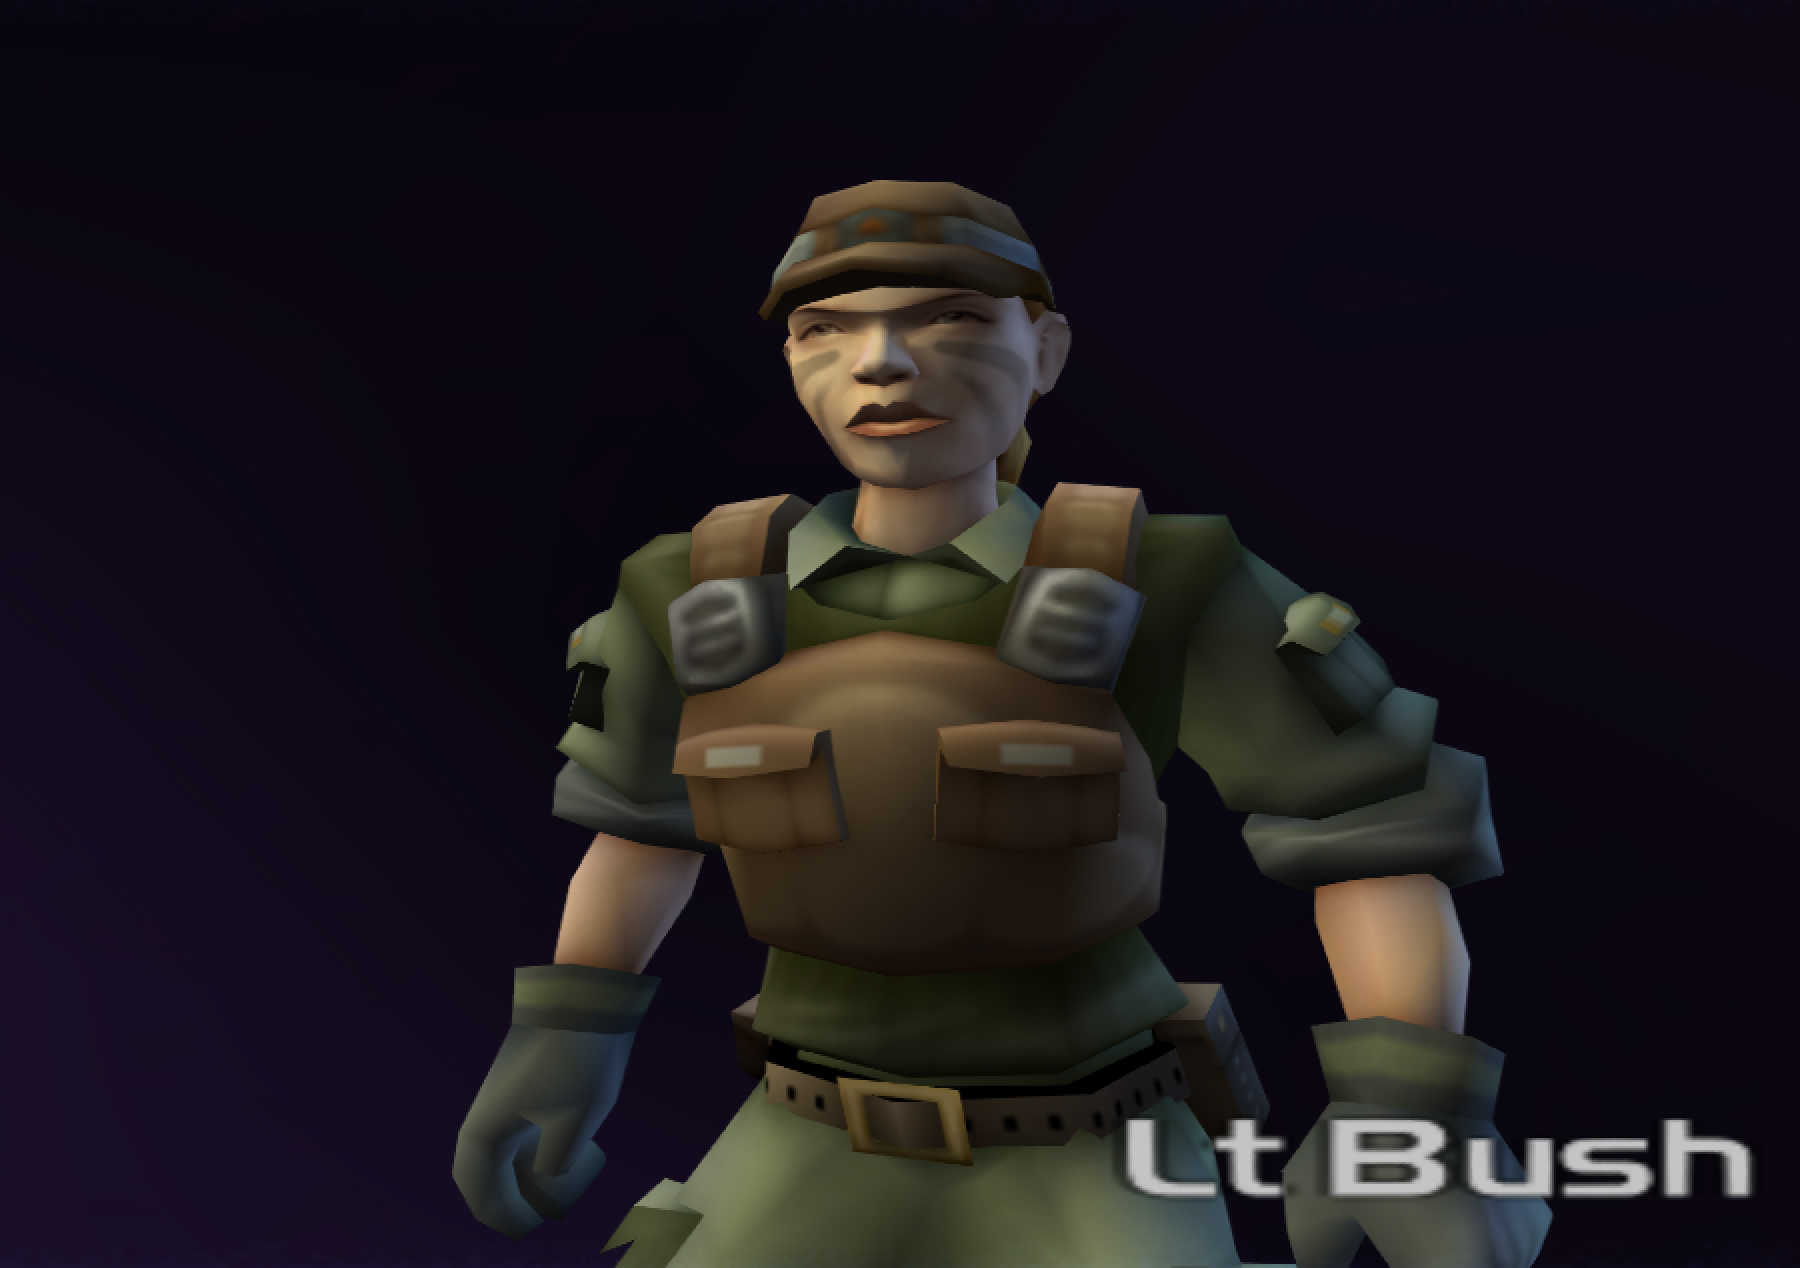 Lieutenant Bush